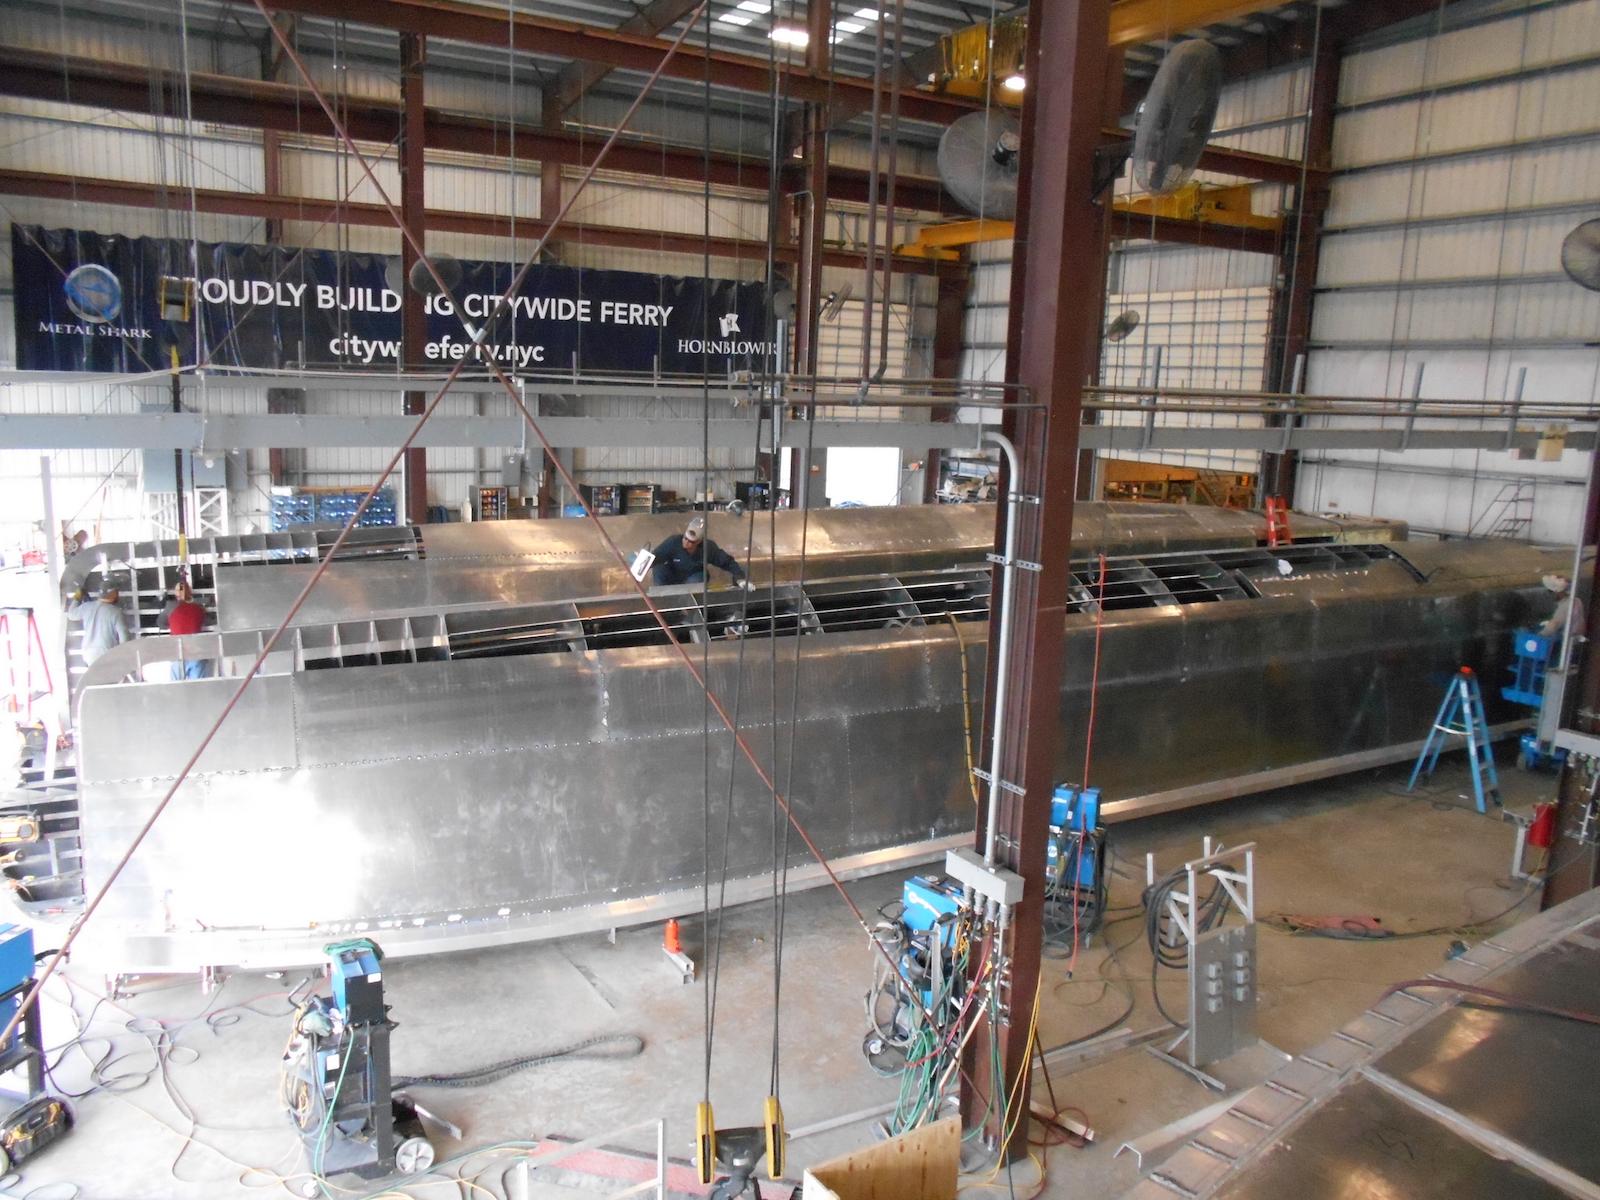 Metal Shark shipyard